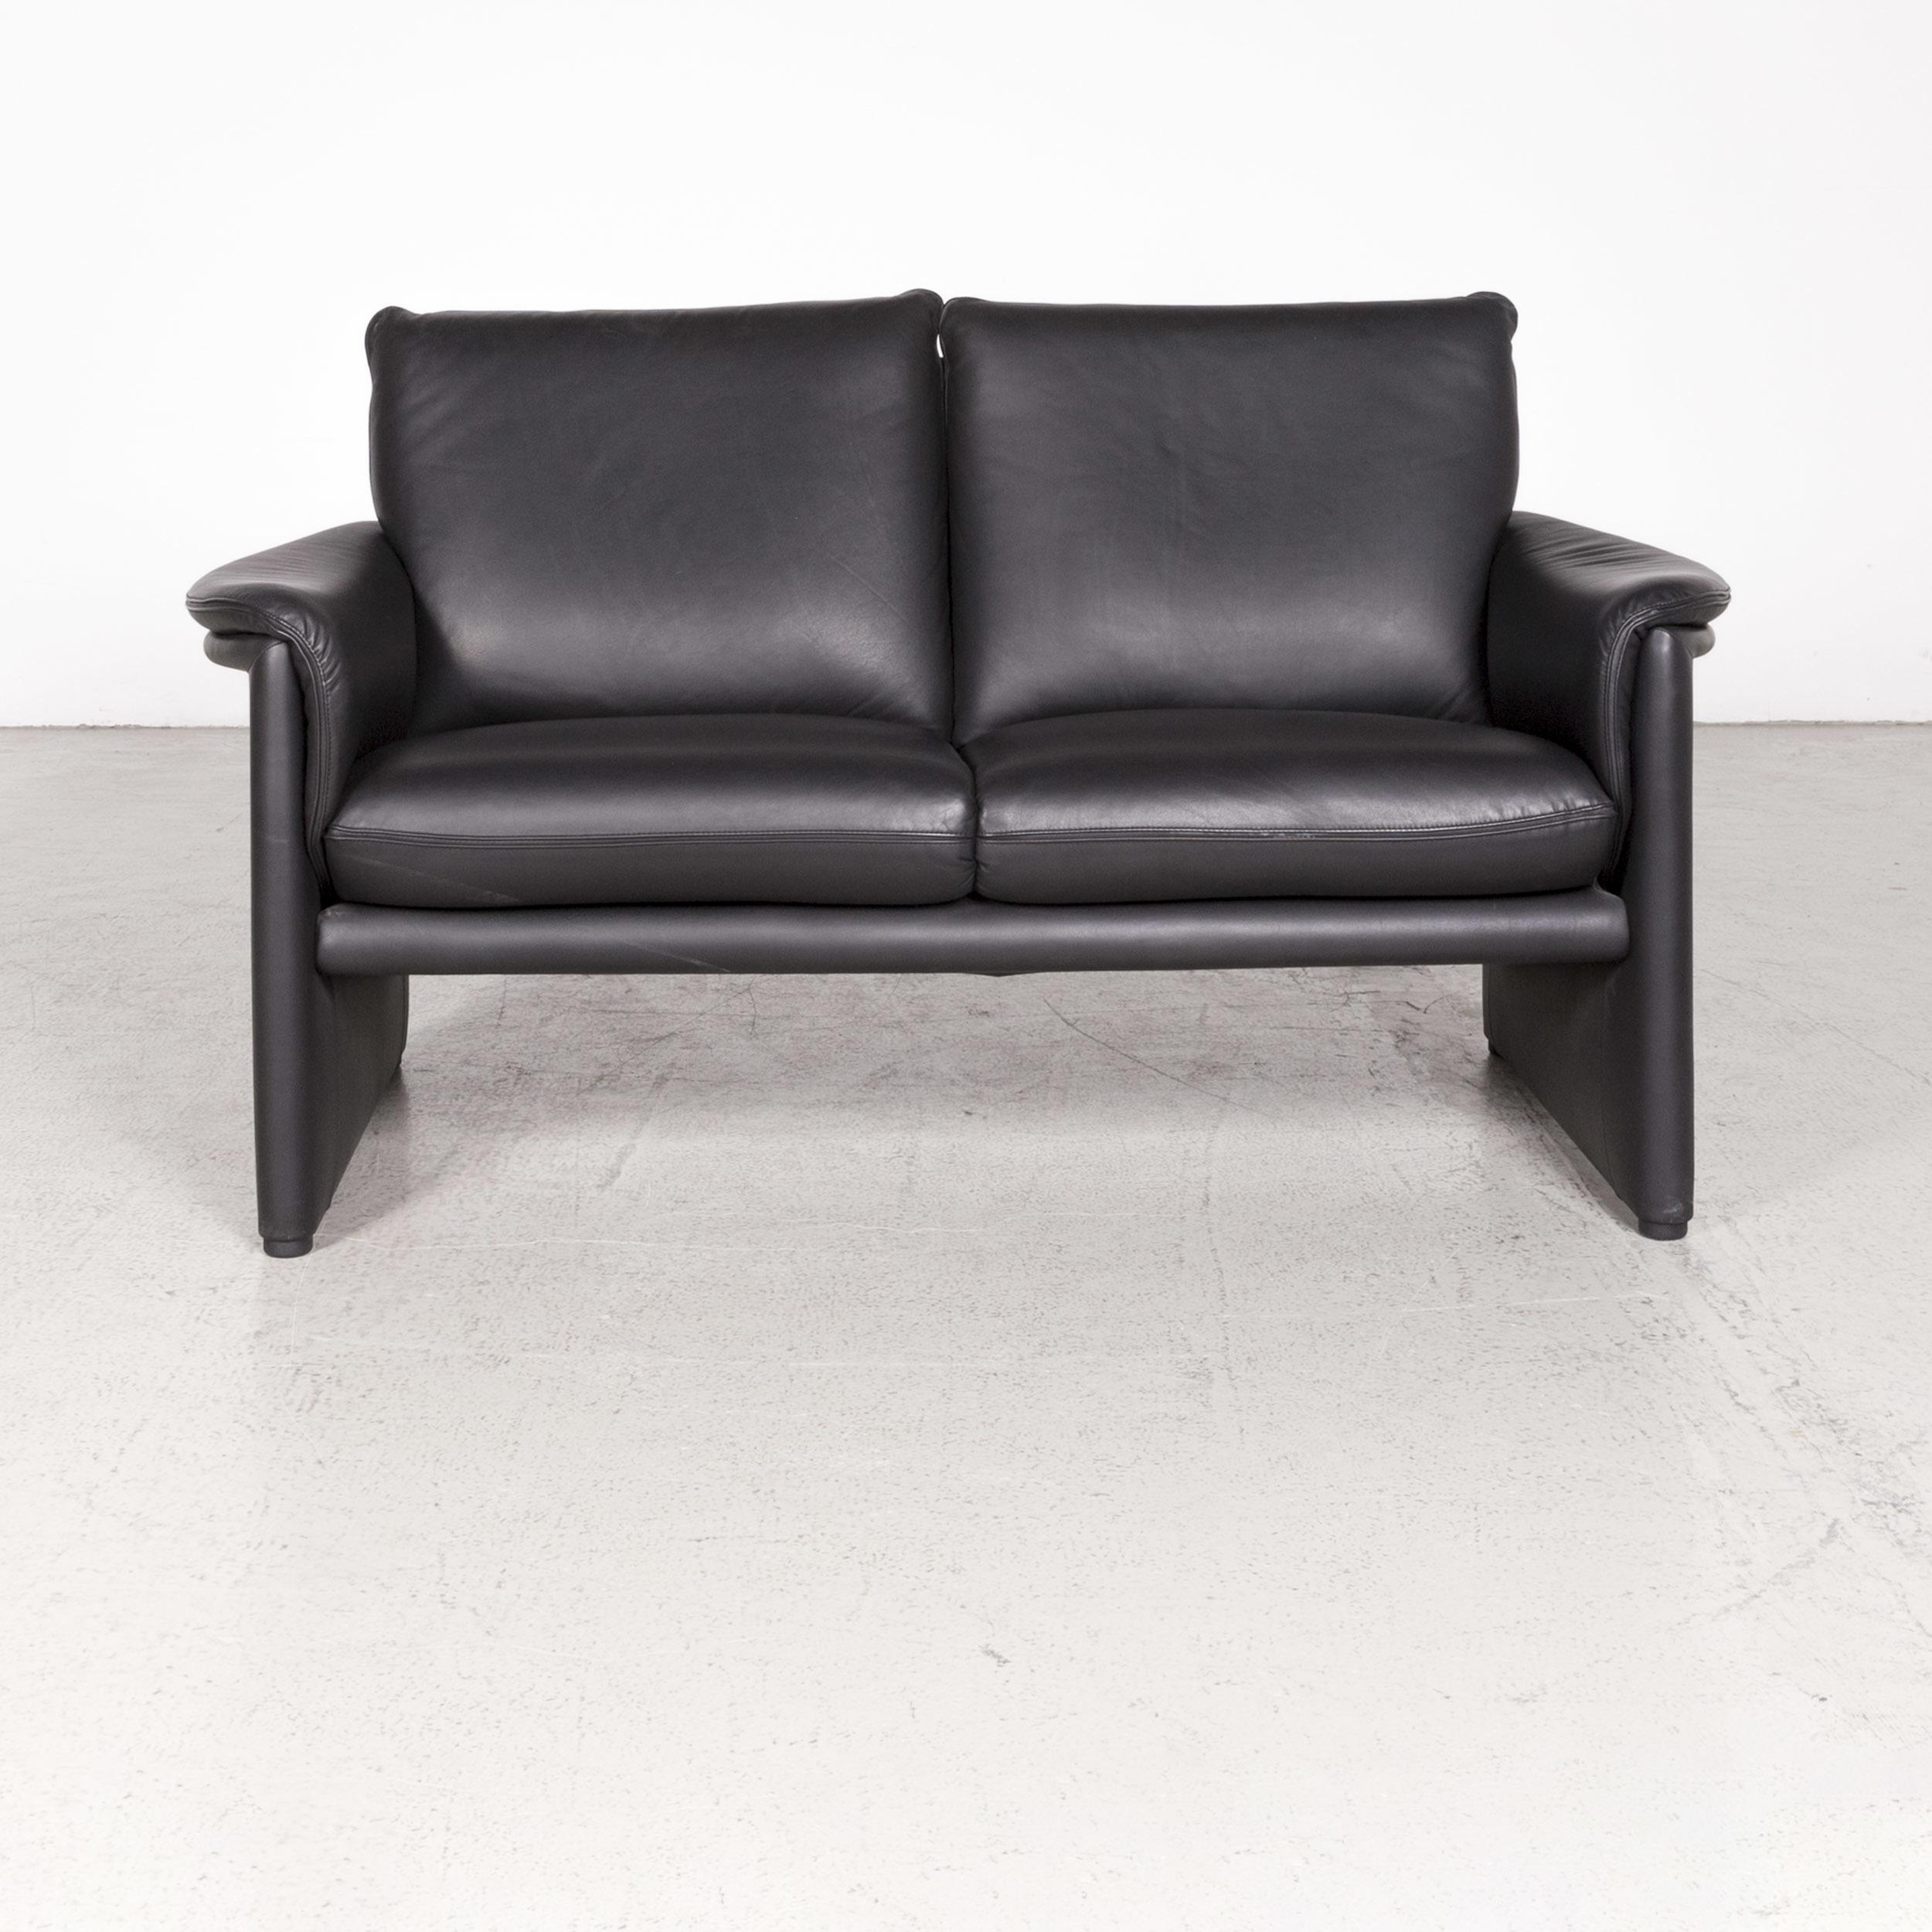 Cor Zento Designer Leather Sofa Black Genuine Leather Two ...